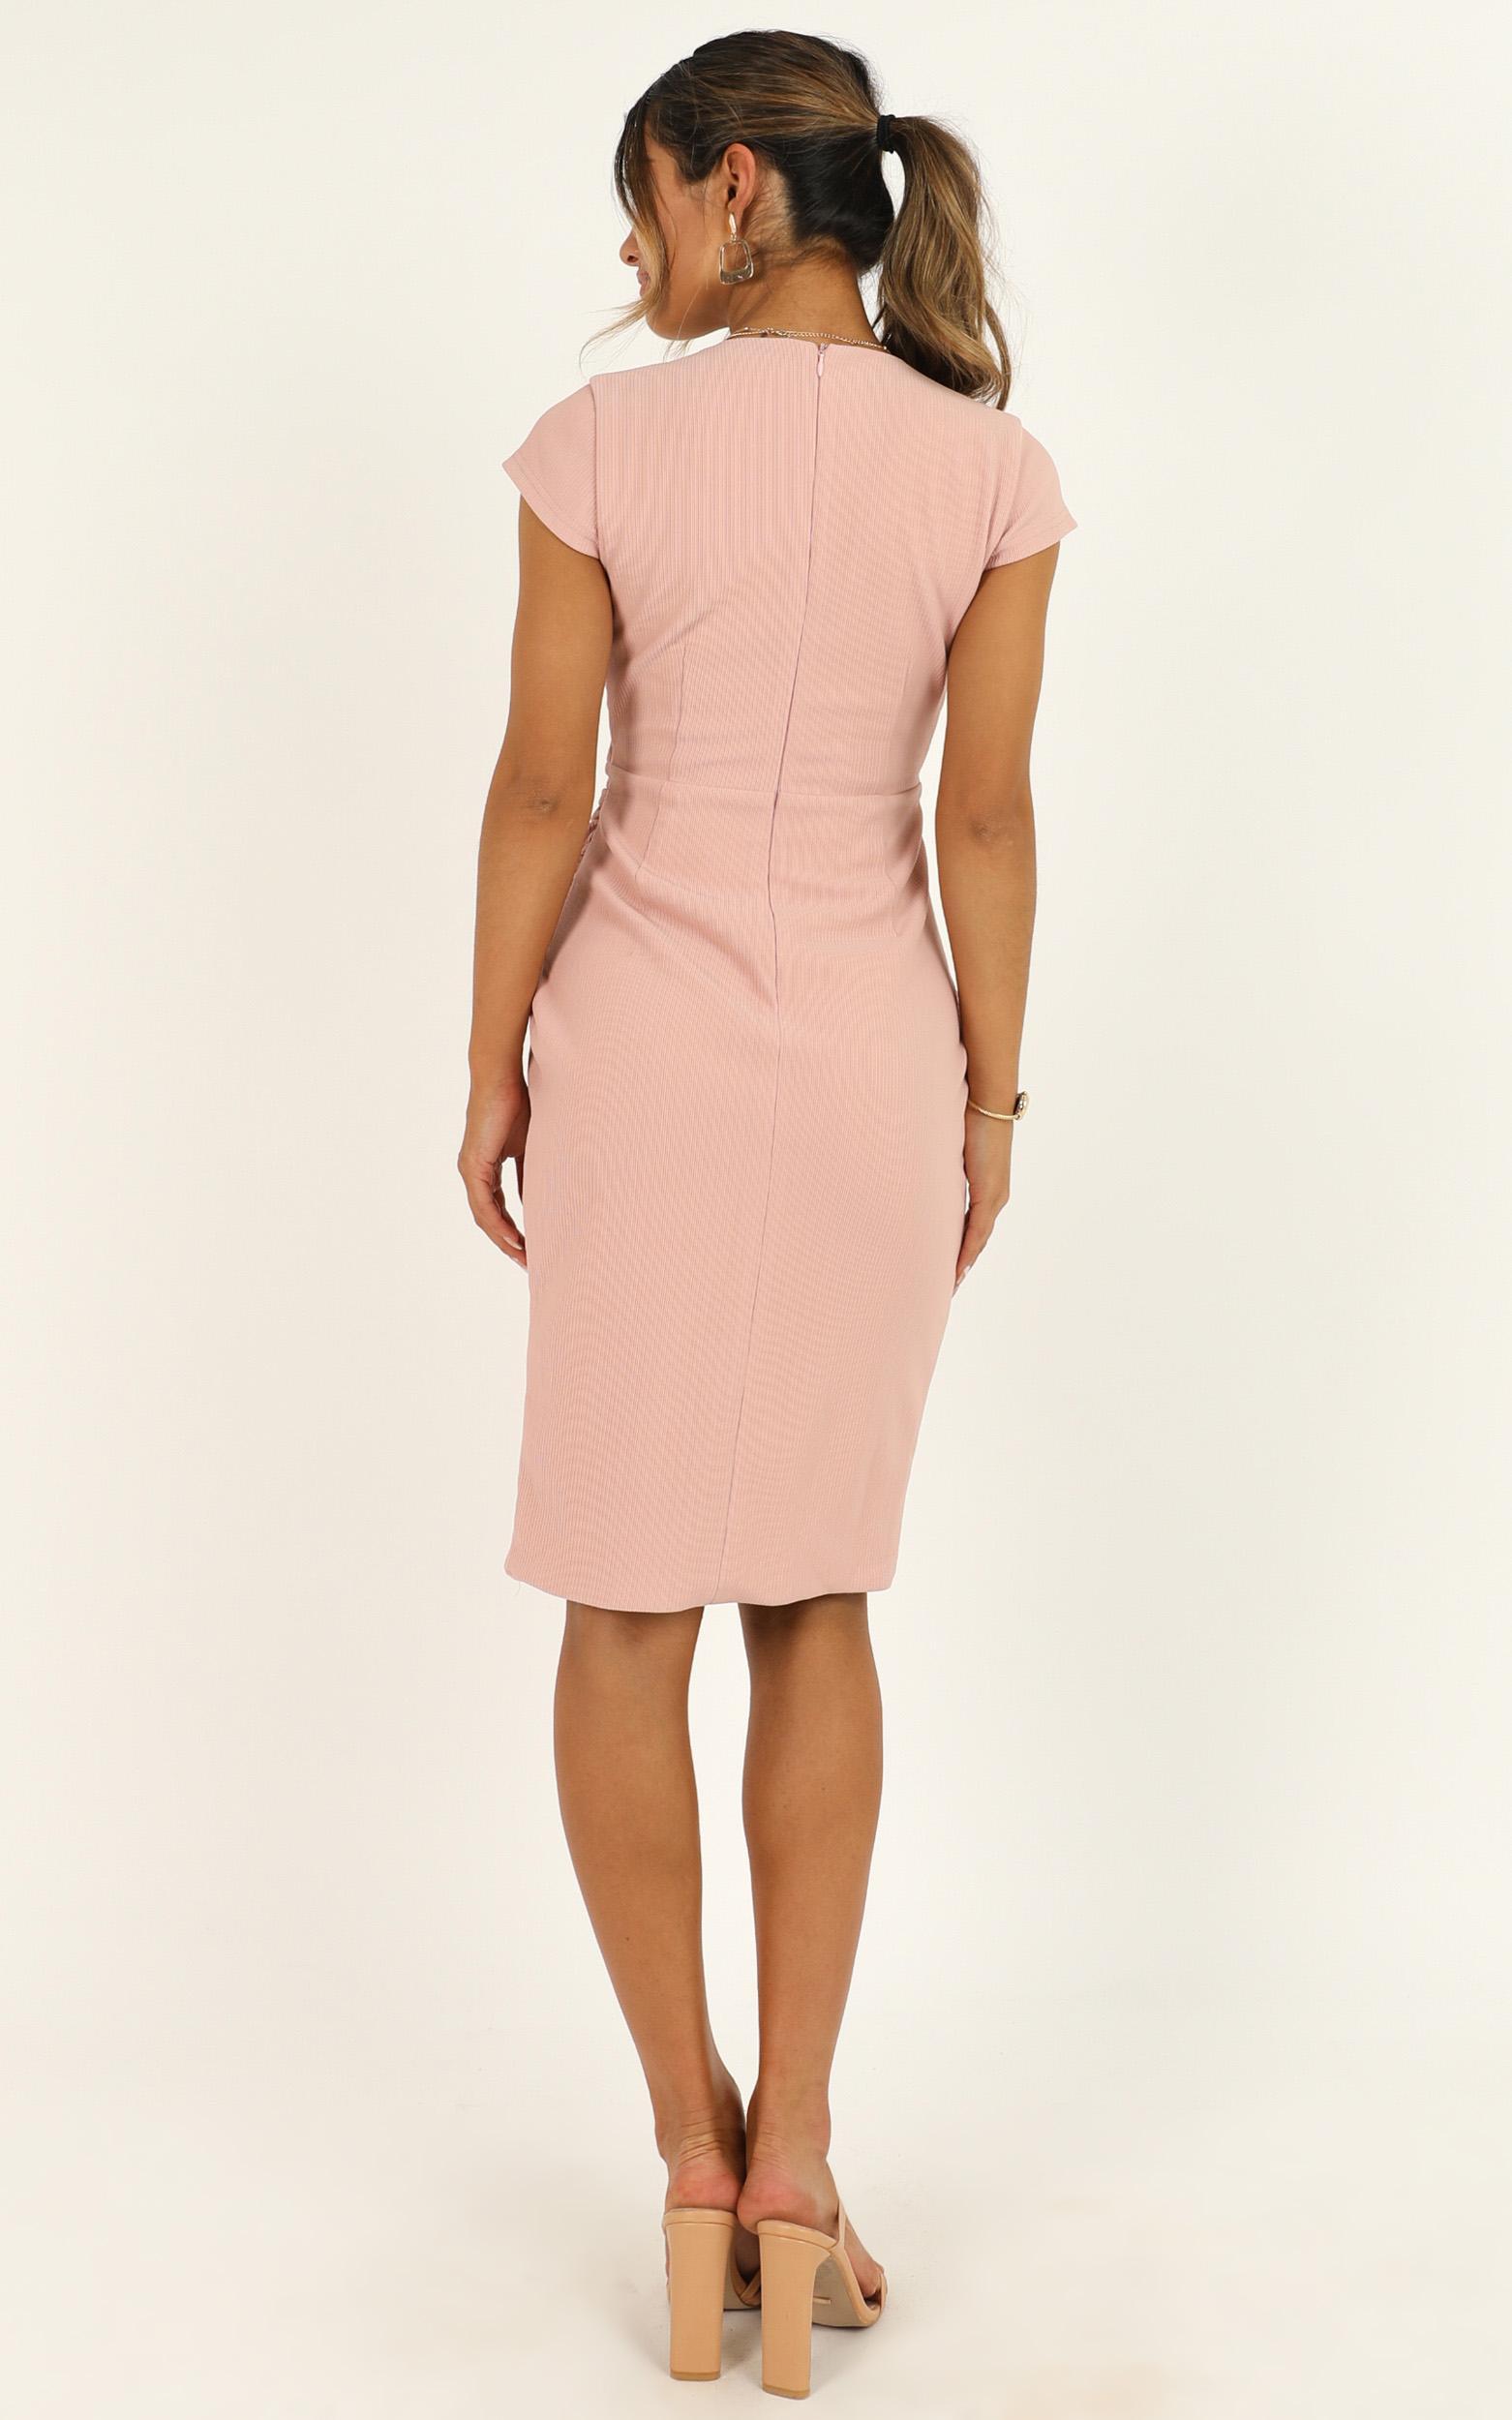 Quick Decider Dress in blush - 20 (XXXXL), Blush, hi-res image number null